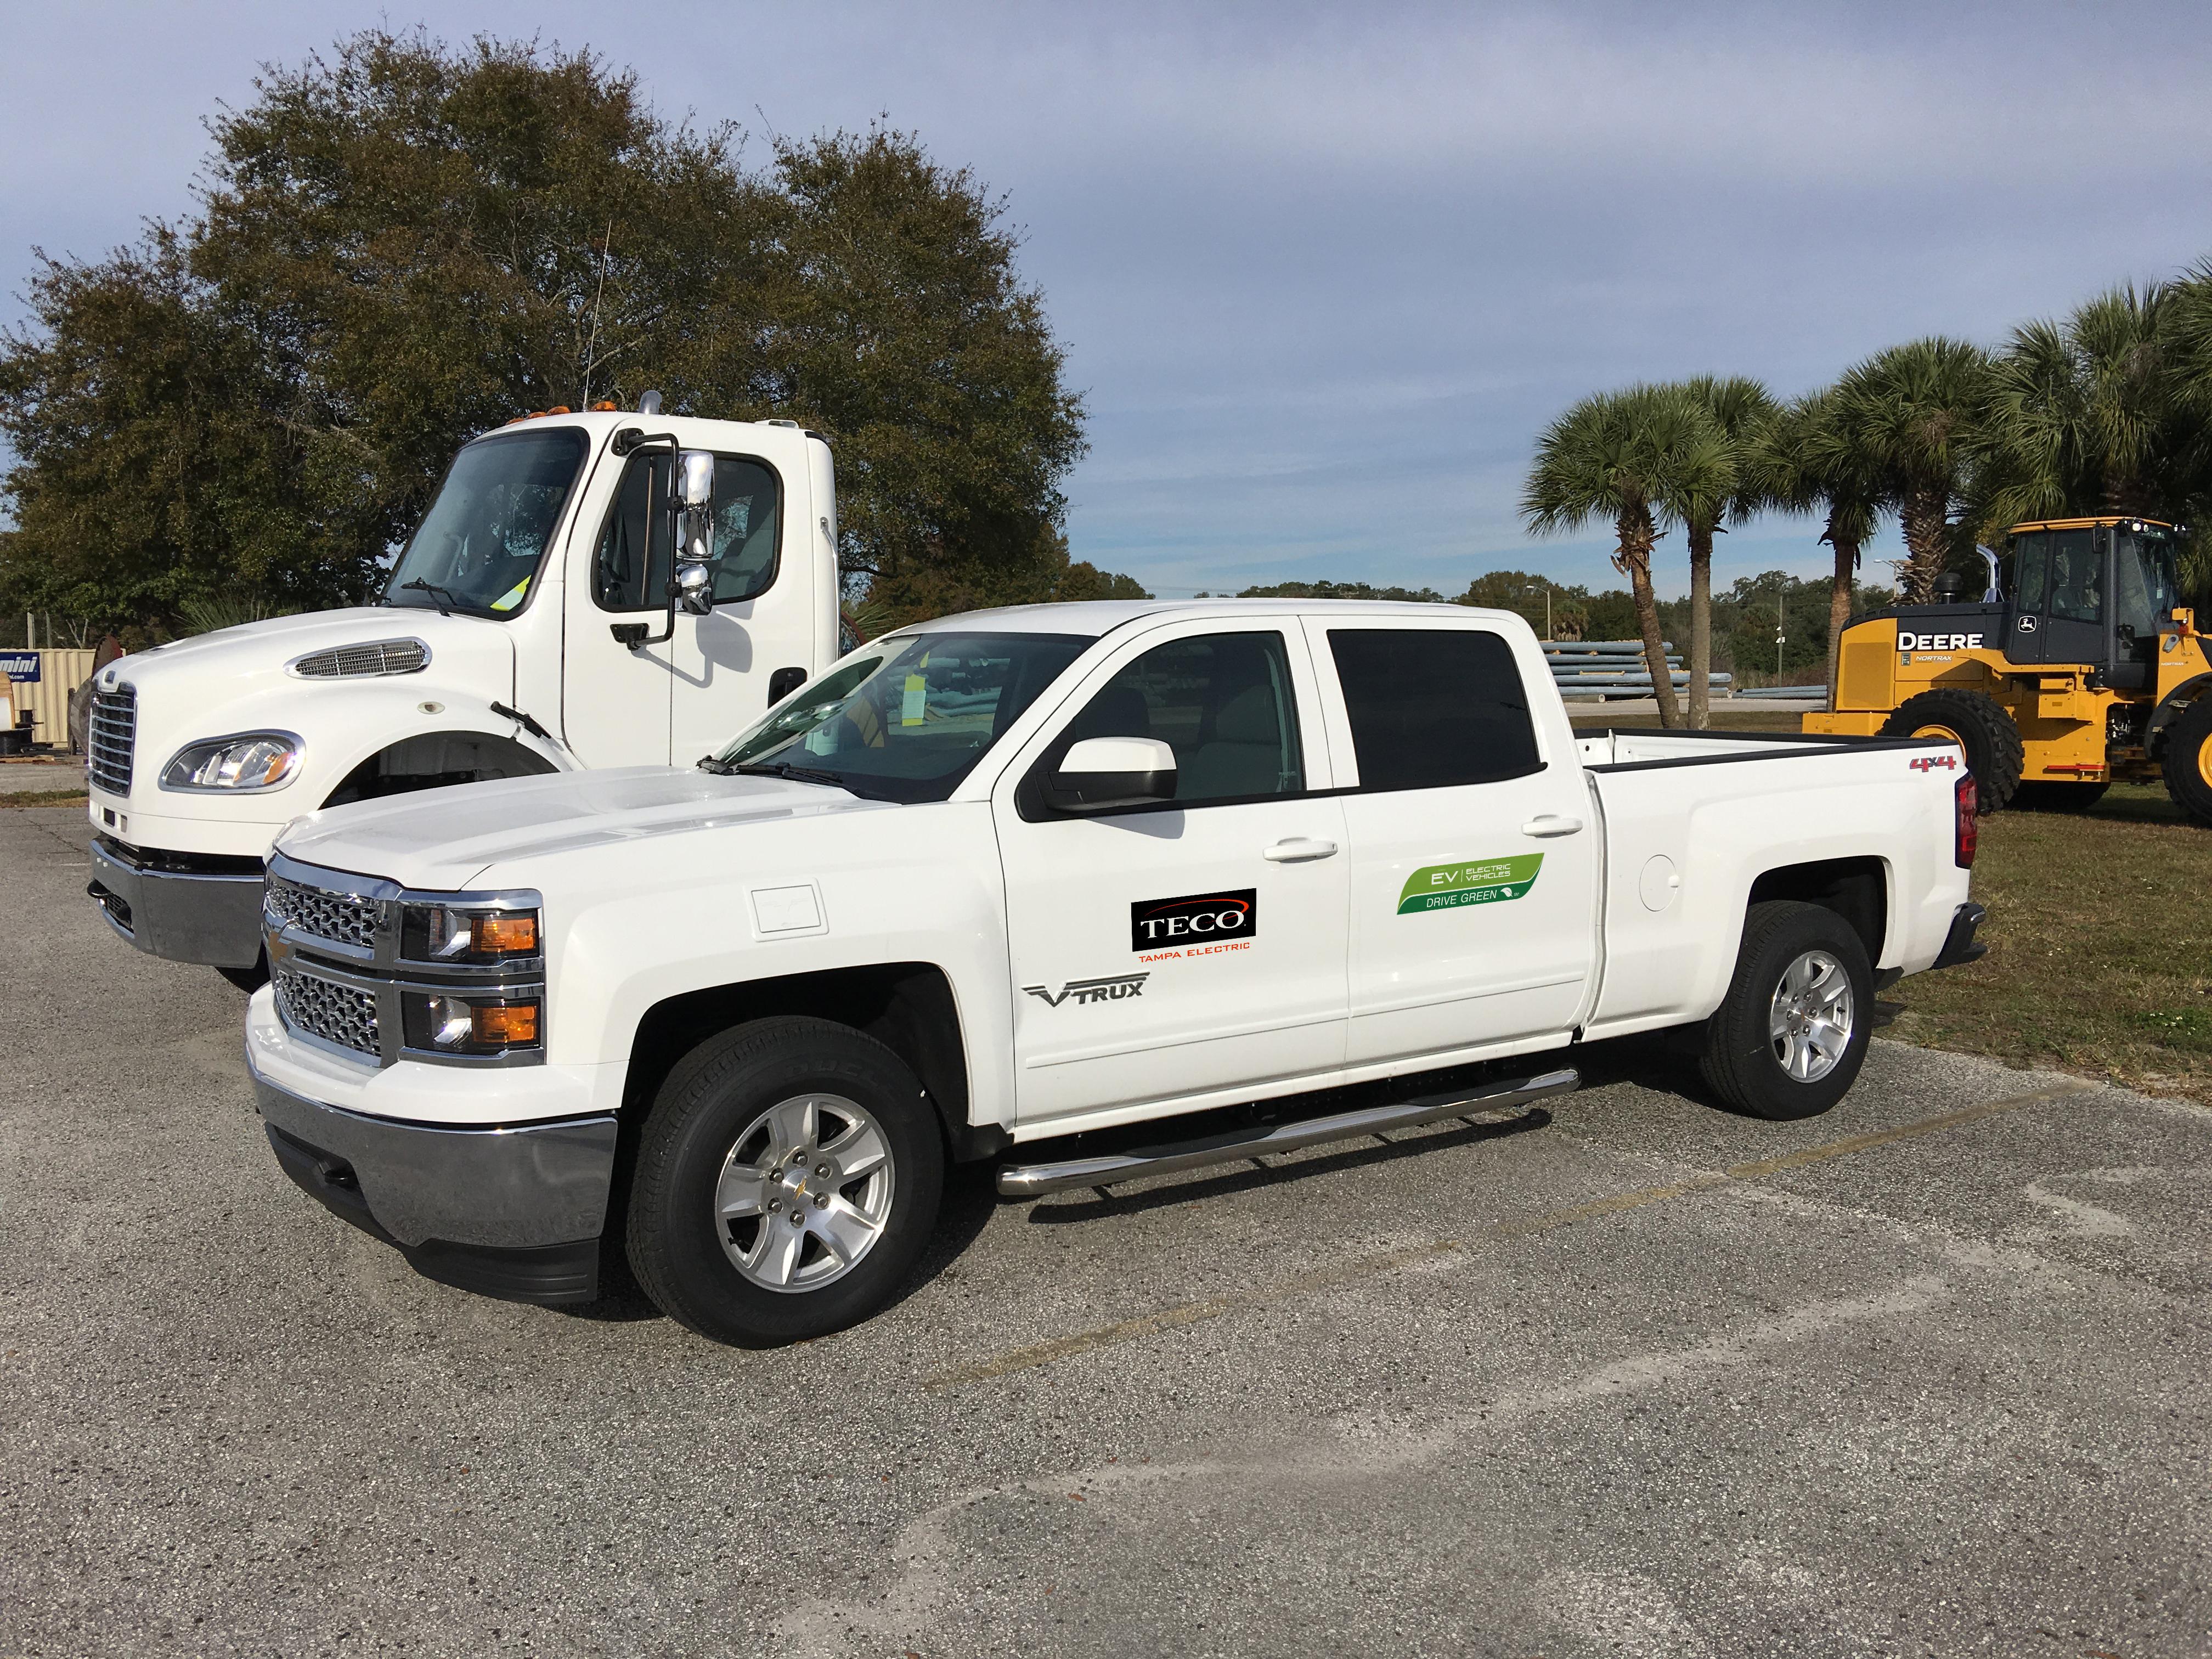 Teco Adds Plug In Electric Pickup Trucks To Its Green Fleet